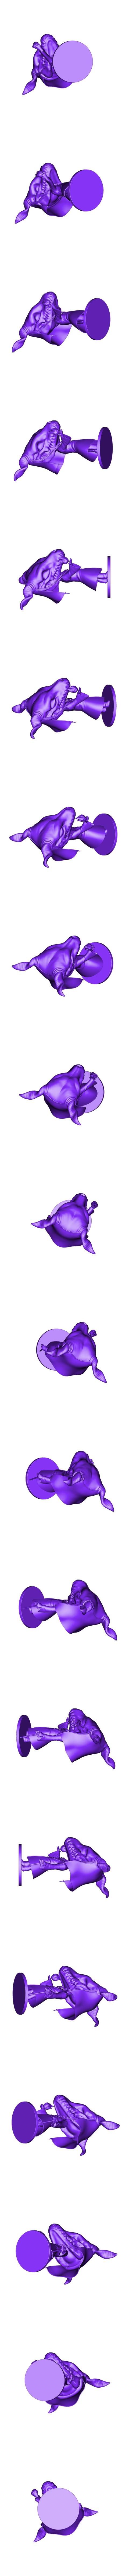 FullModel.stl Download STL file Elias Ainsworth Chibi figurine • 3D print design, Kownus